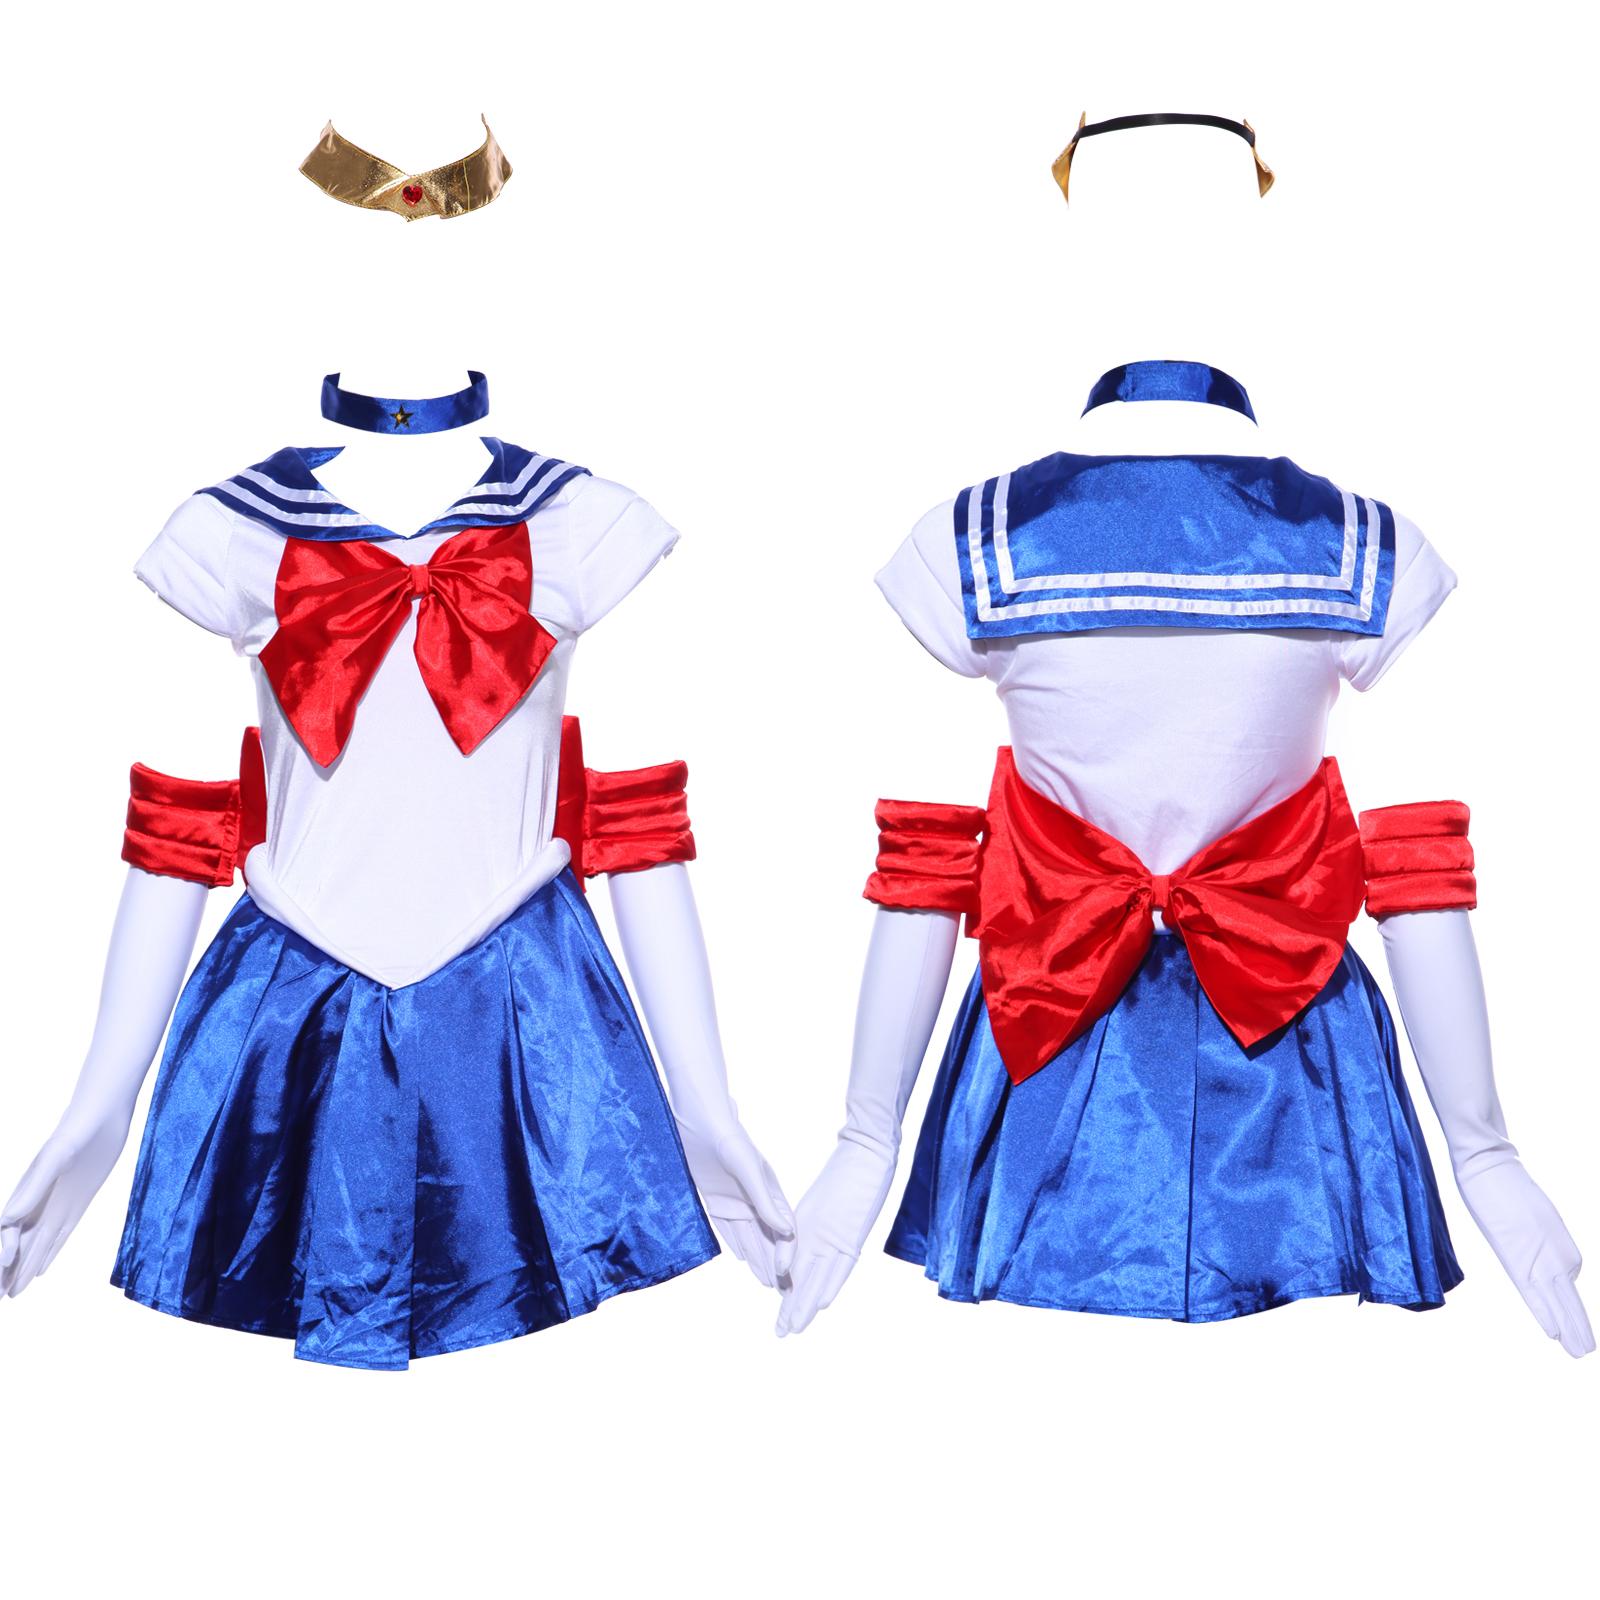 Sexy sailormoon costume-9527